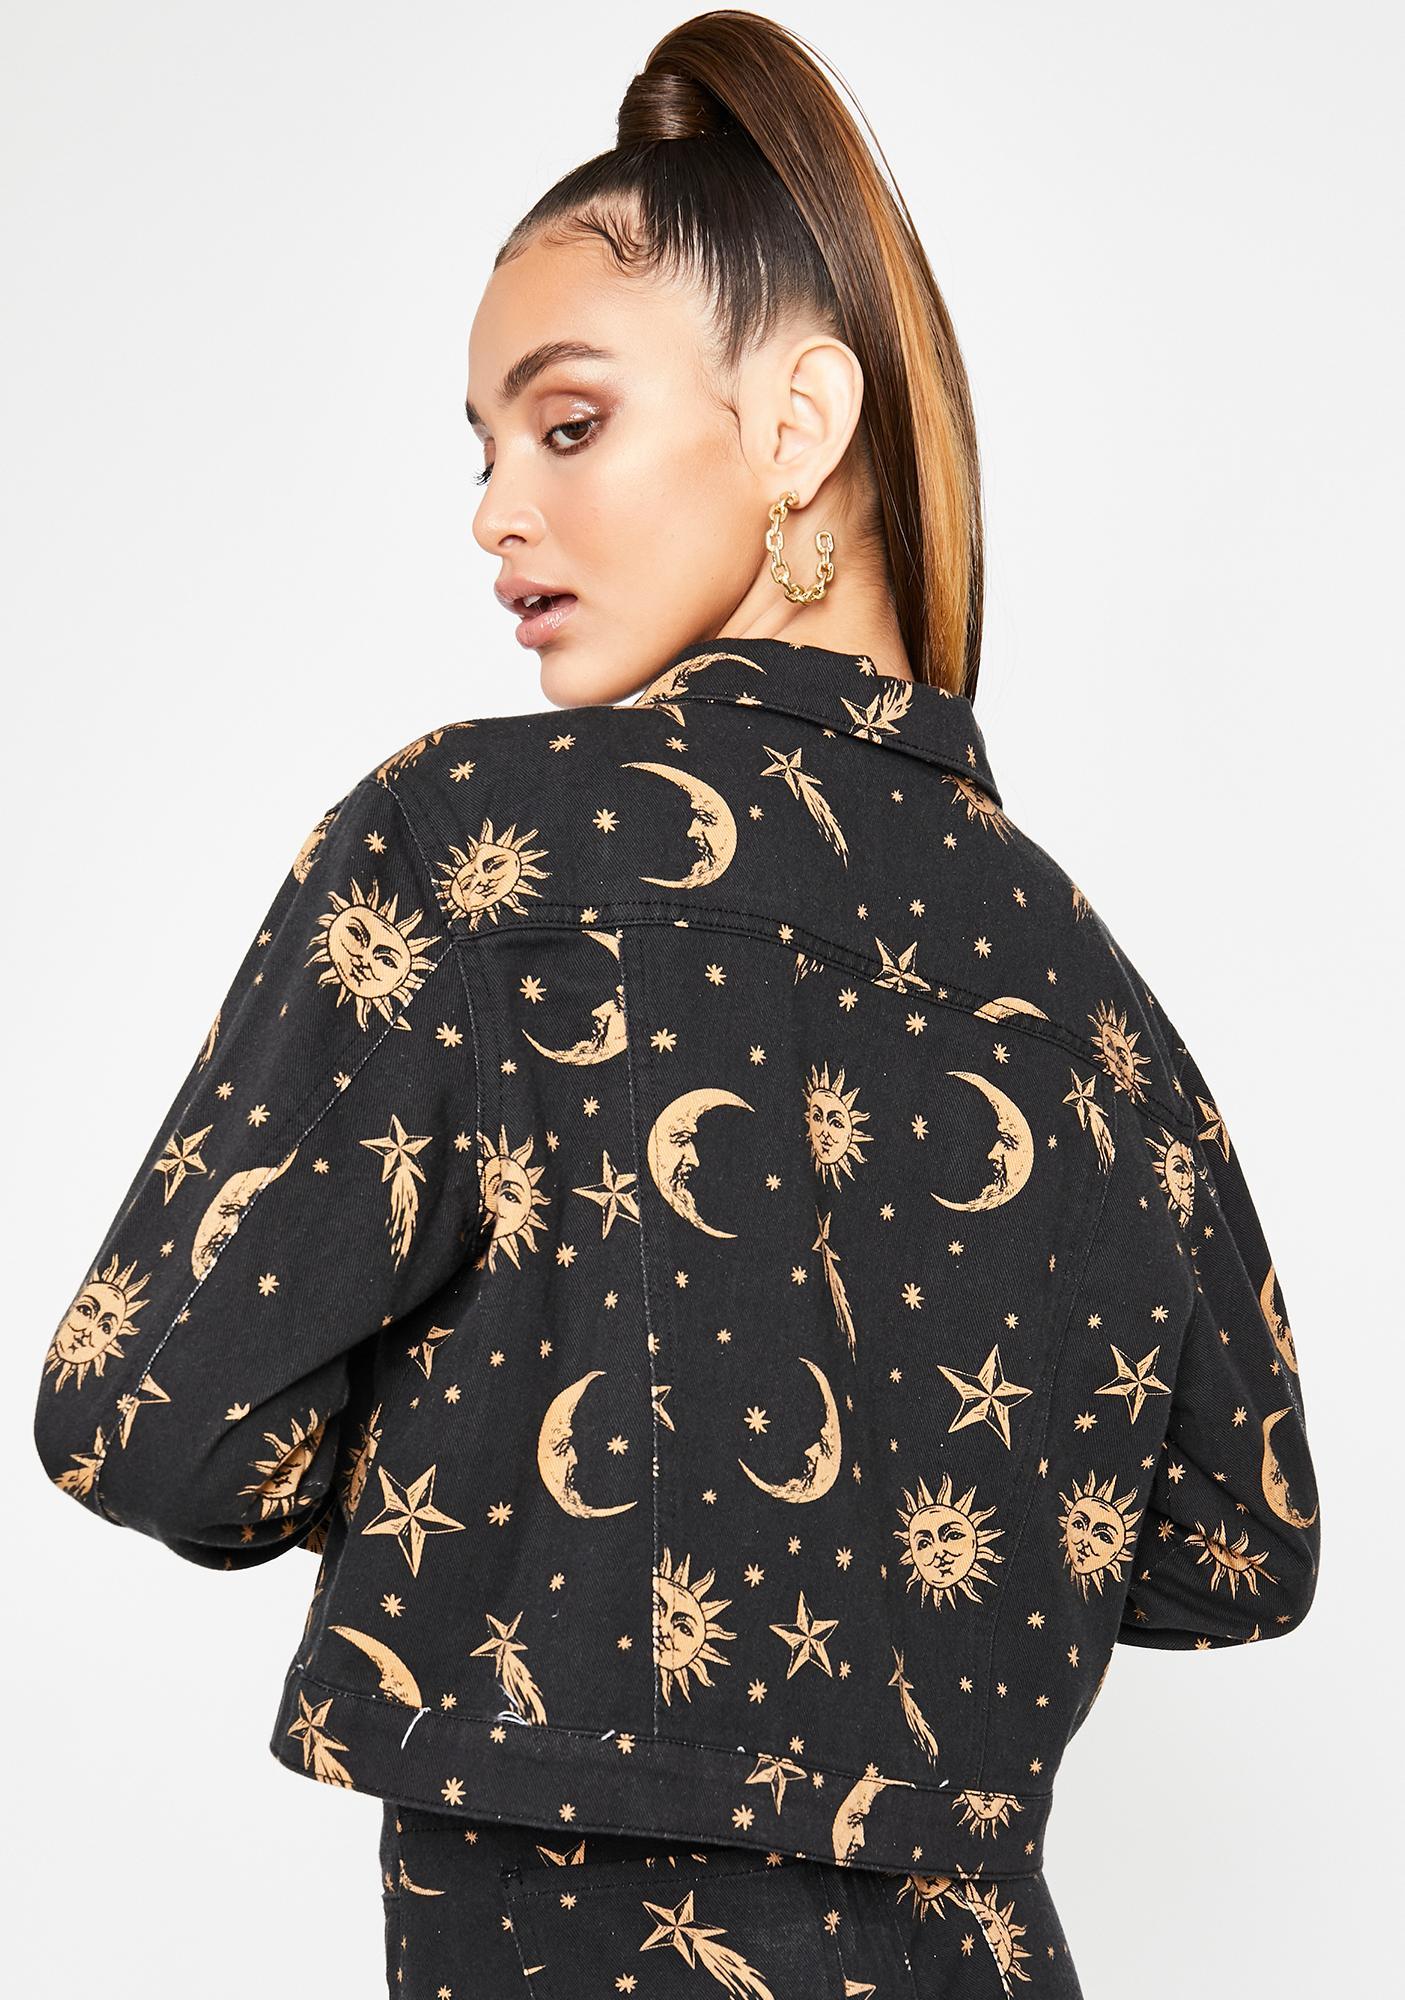 HOROSCOPEZ Walk The Moon Denim Jacket